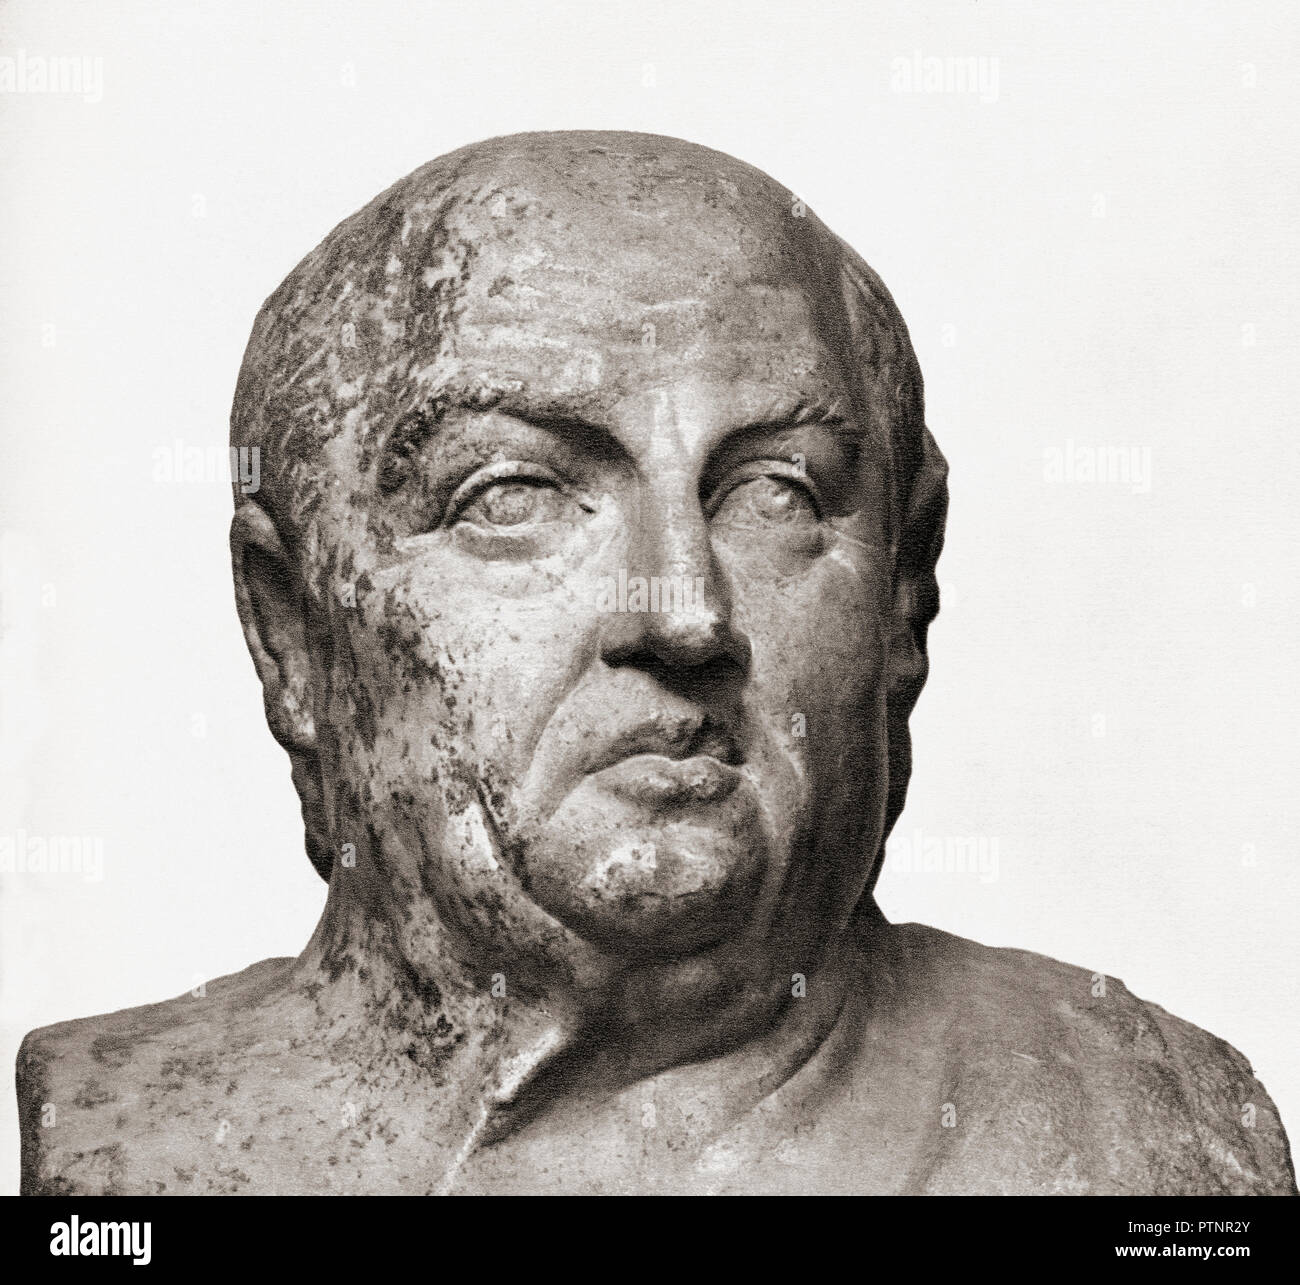 Bust of Seneca the Younger, aka Seneca, c. 4 BC – AD 65.   Roman Stoic philosopher, statesman, dramatist. - Stock Image